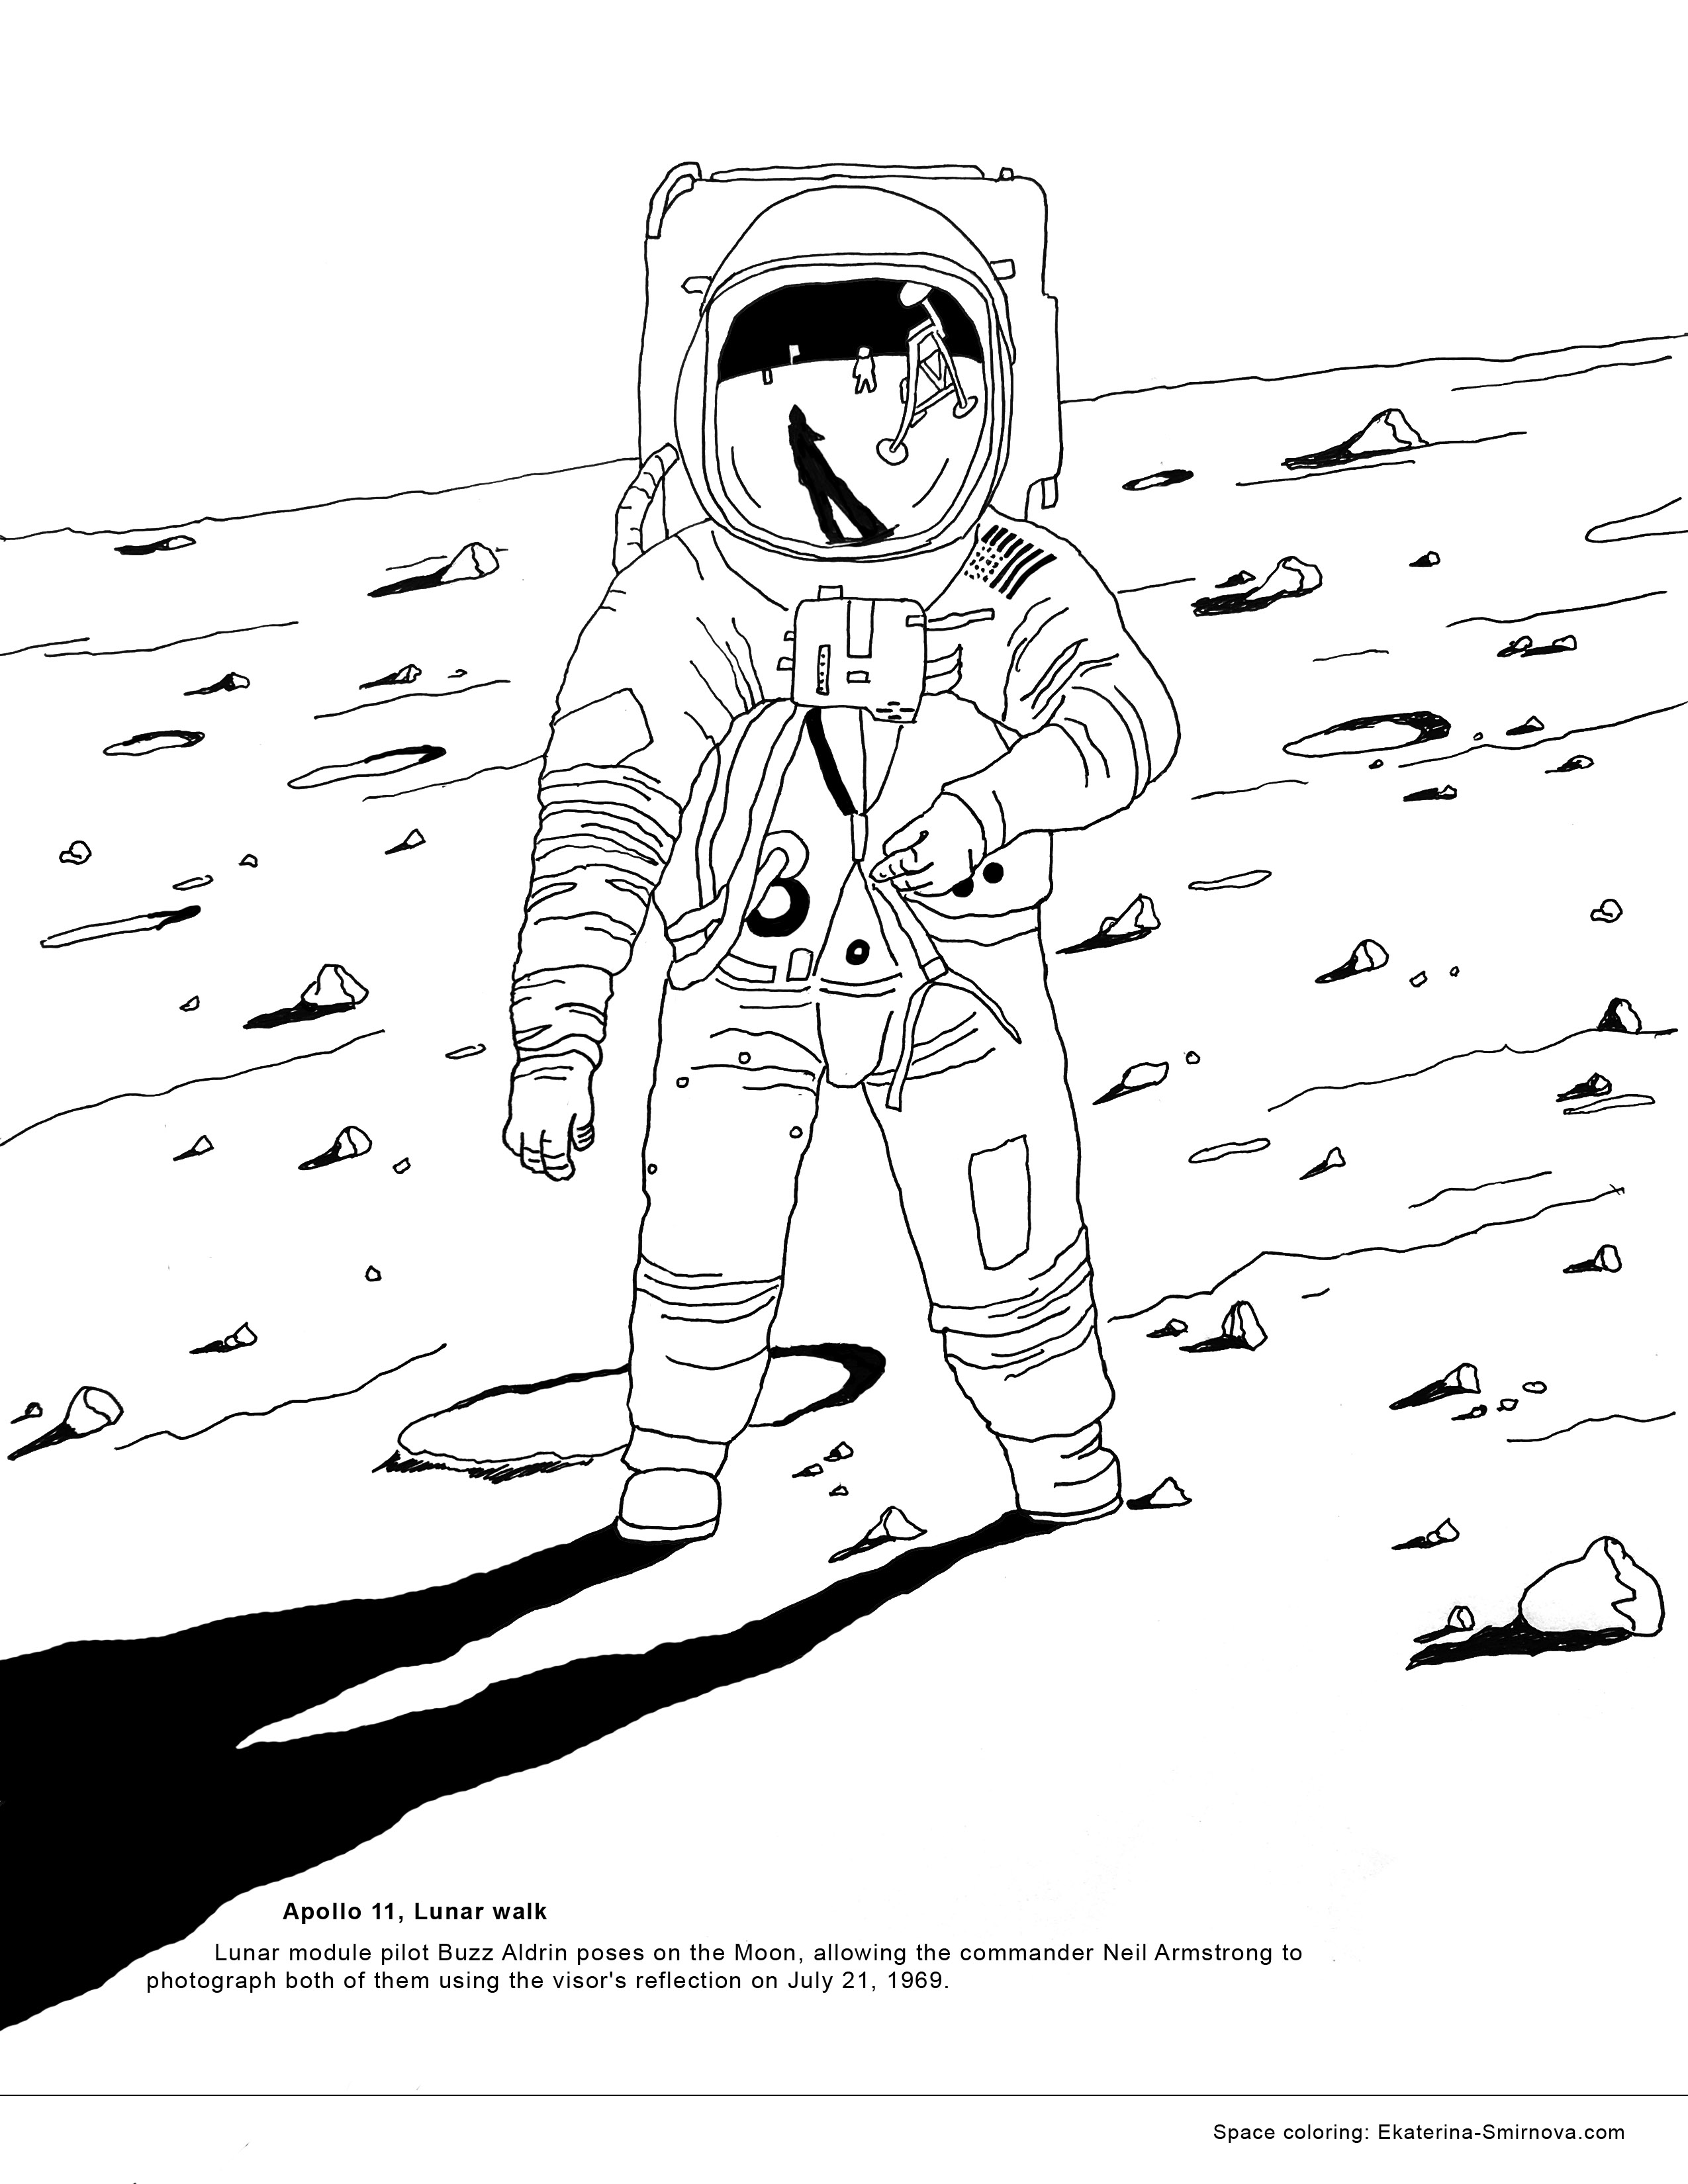 Coloring Book For Space Missions Juno Rosetta Cassini Ekaterina Smirnova